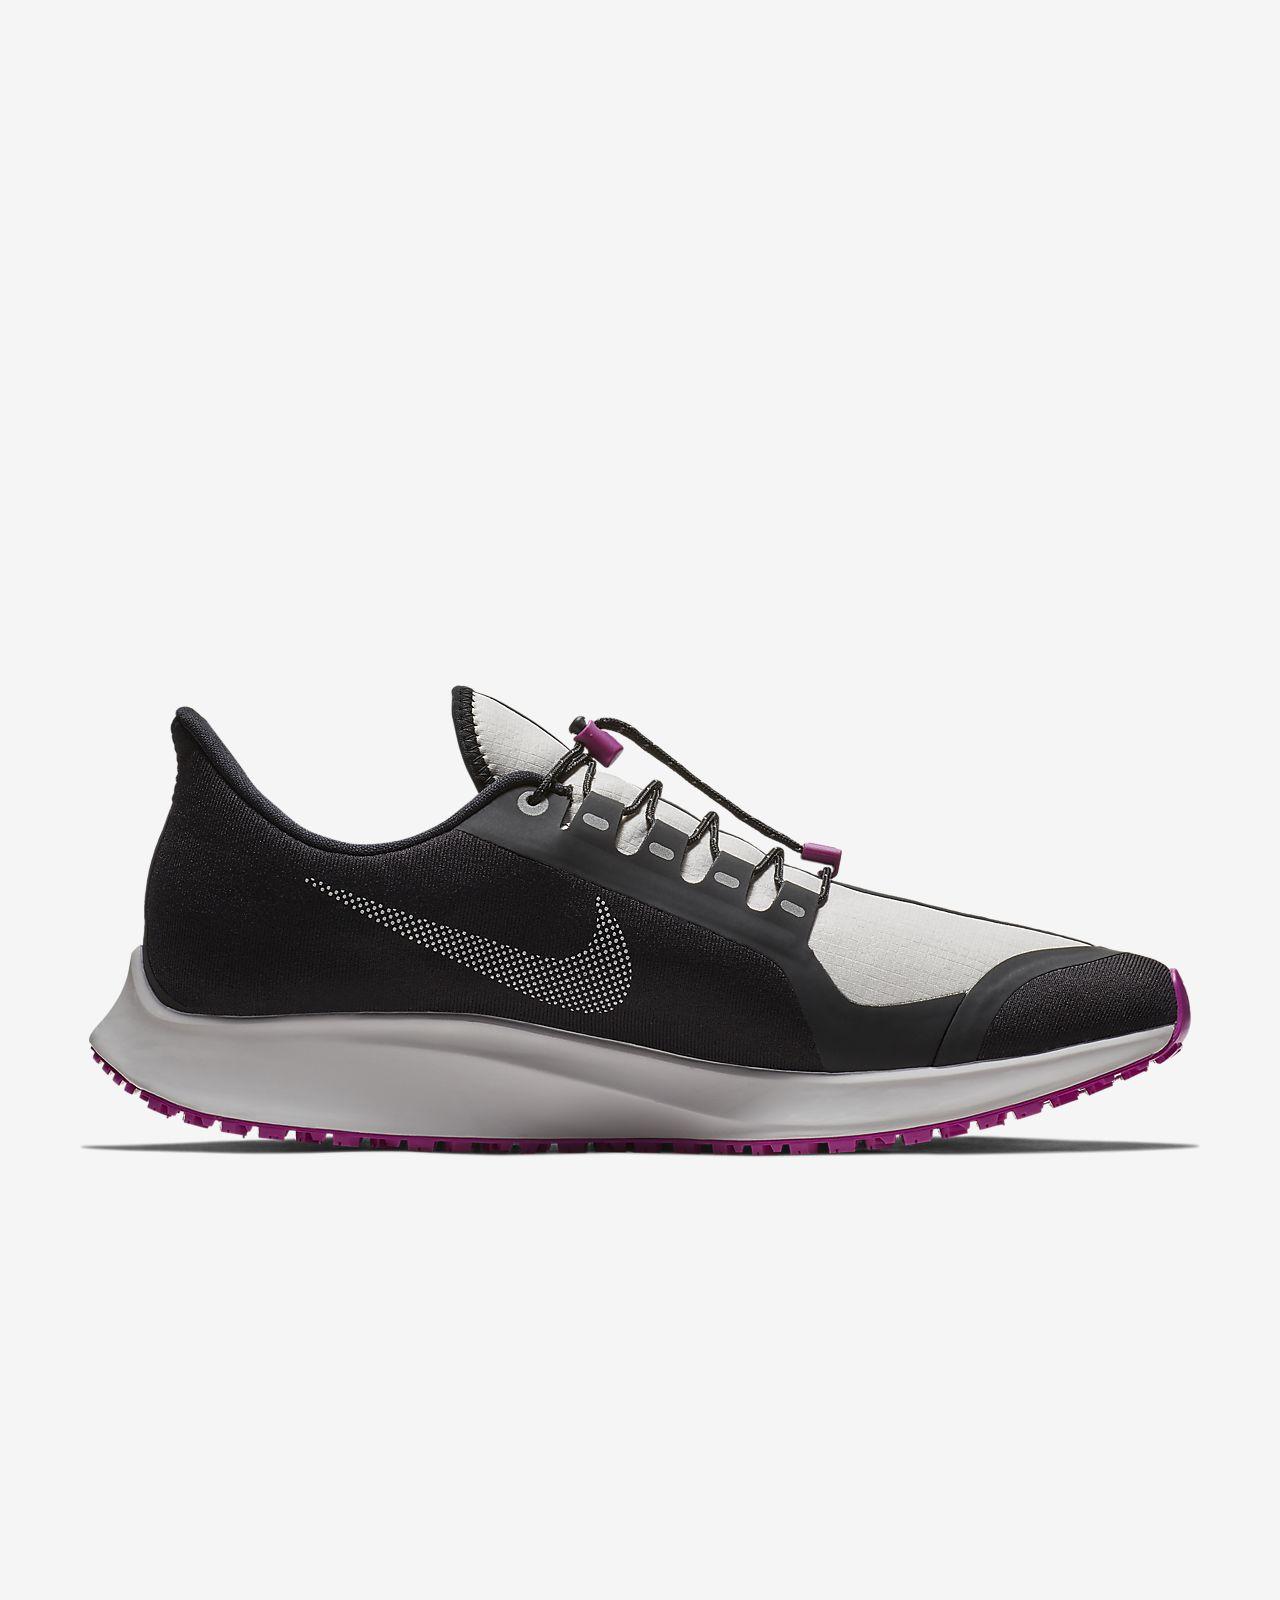 f19024dc8 ... Nike Air Zoom Pegasus 35 Shield NRG Water-Repellent Zapatillas de  running - Hombre